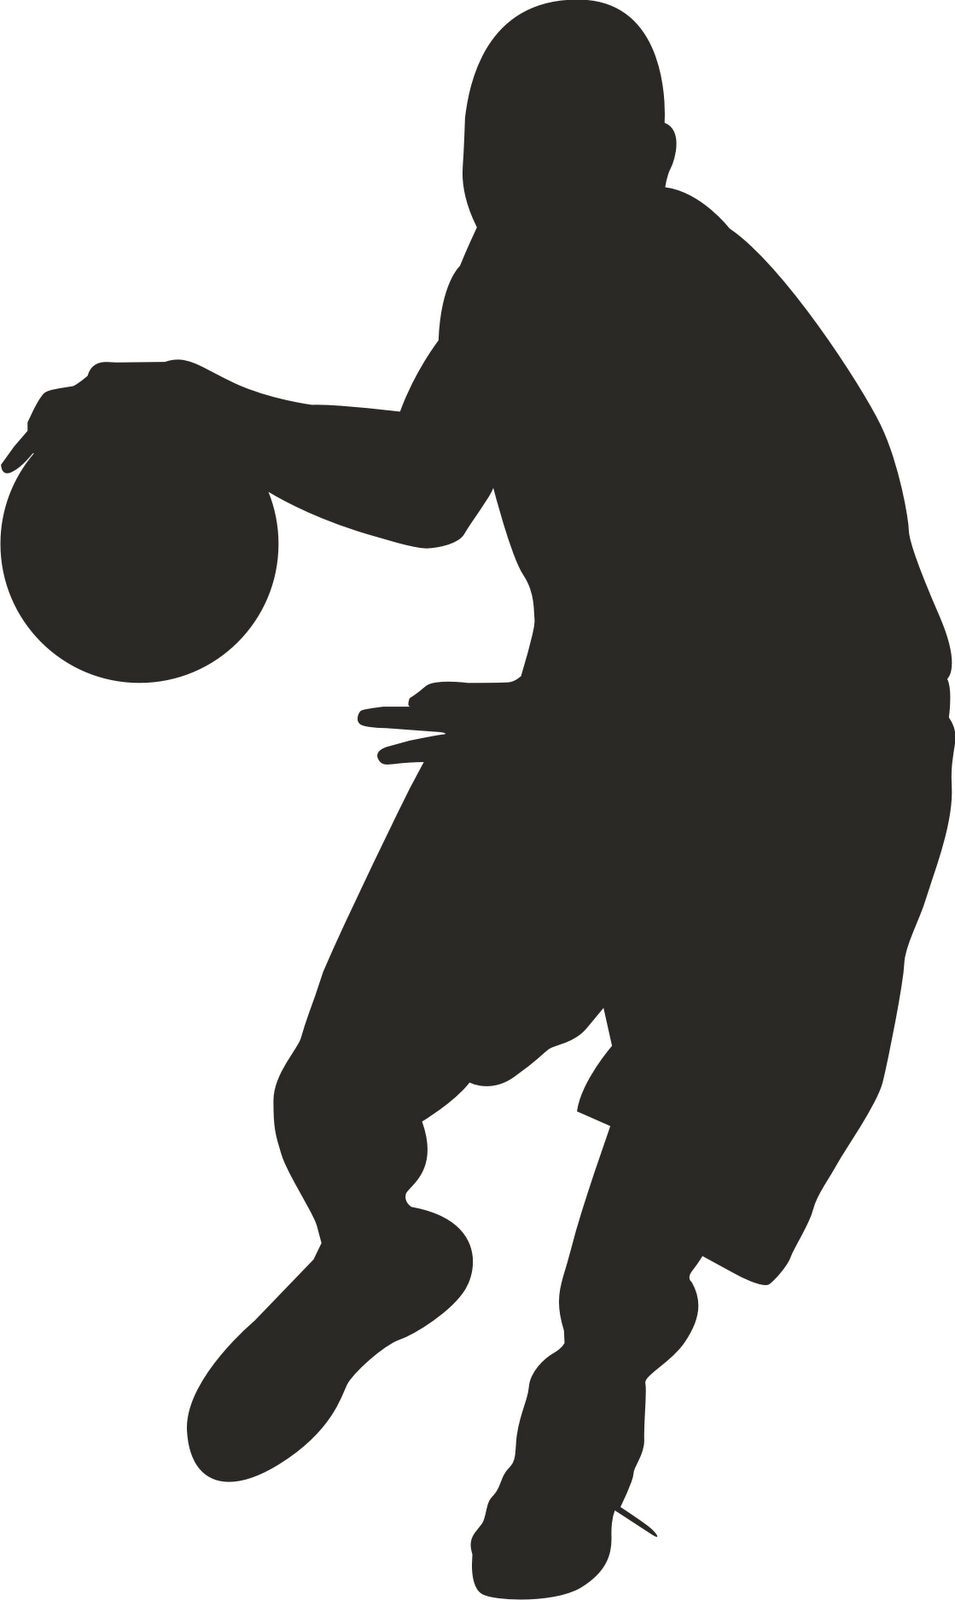 955x1600 Basketball Black White Basketball Player Clipart Black